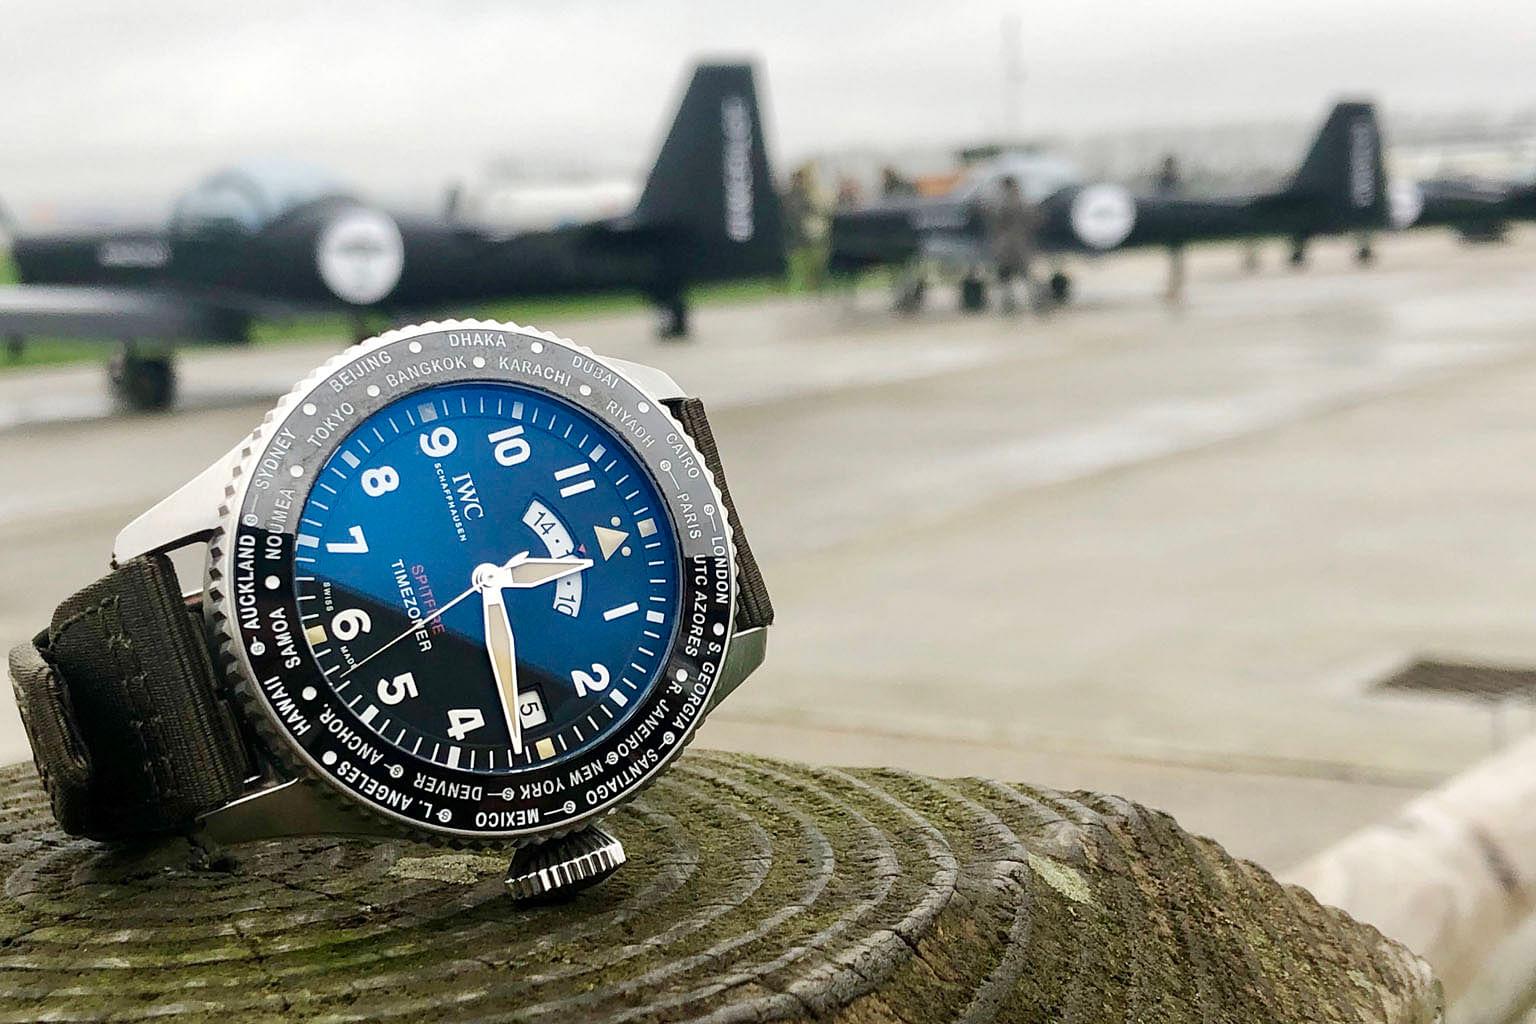 cd7d7faf340 WC Pilot s Watch Timezoner Spitfire Edition